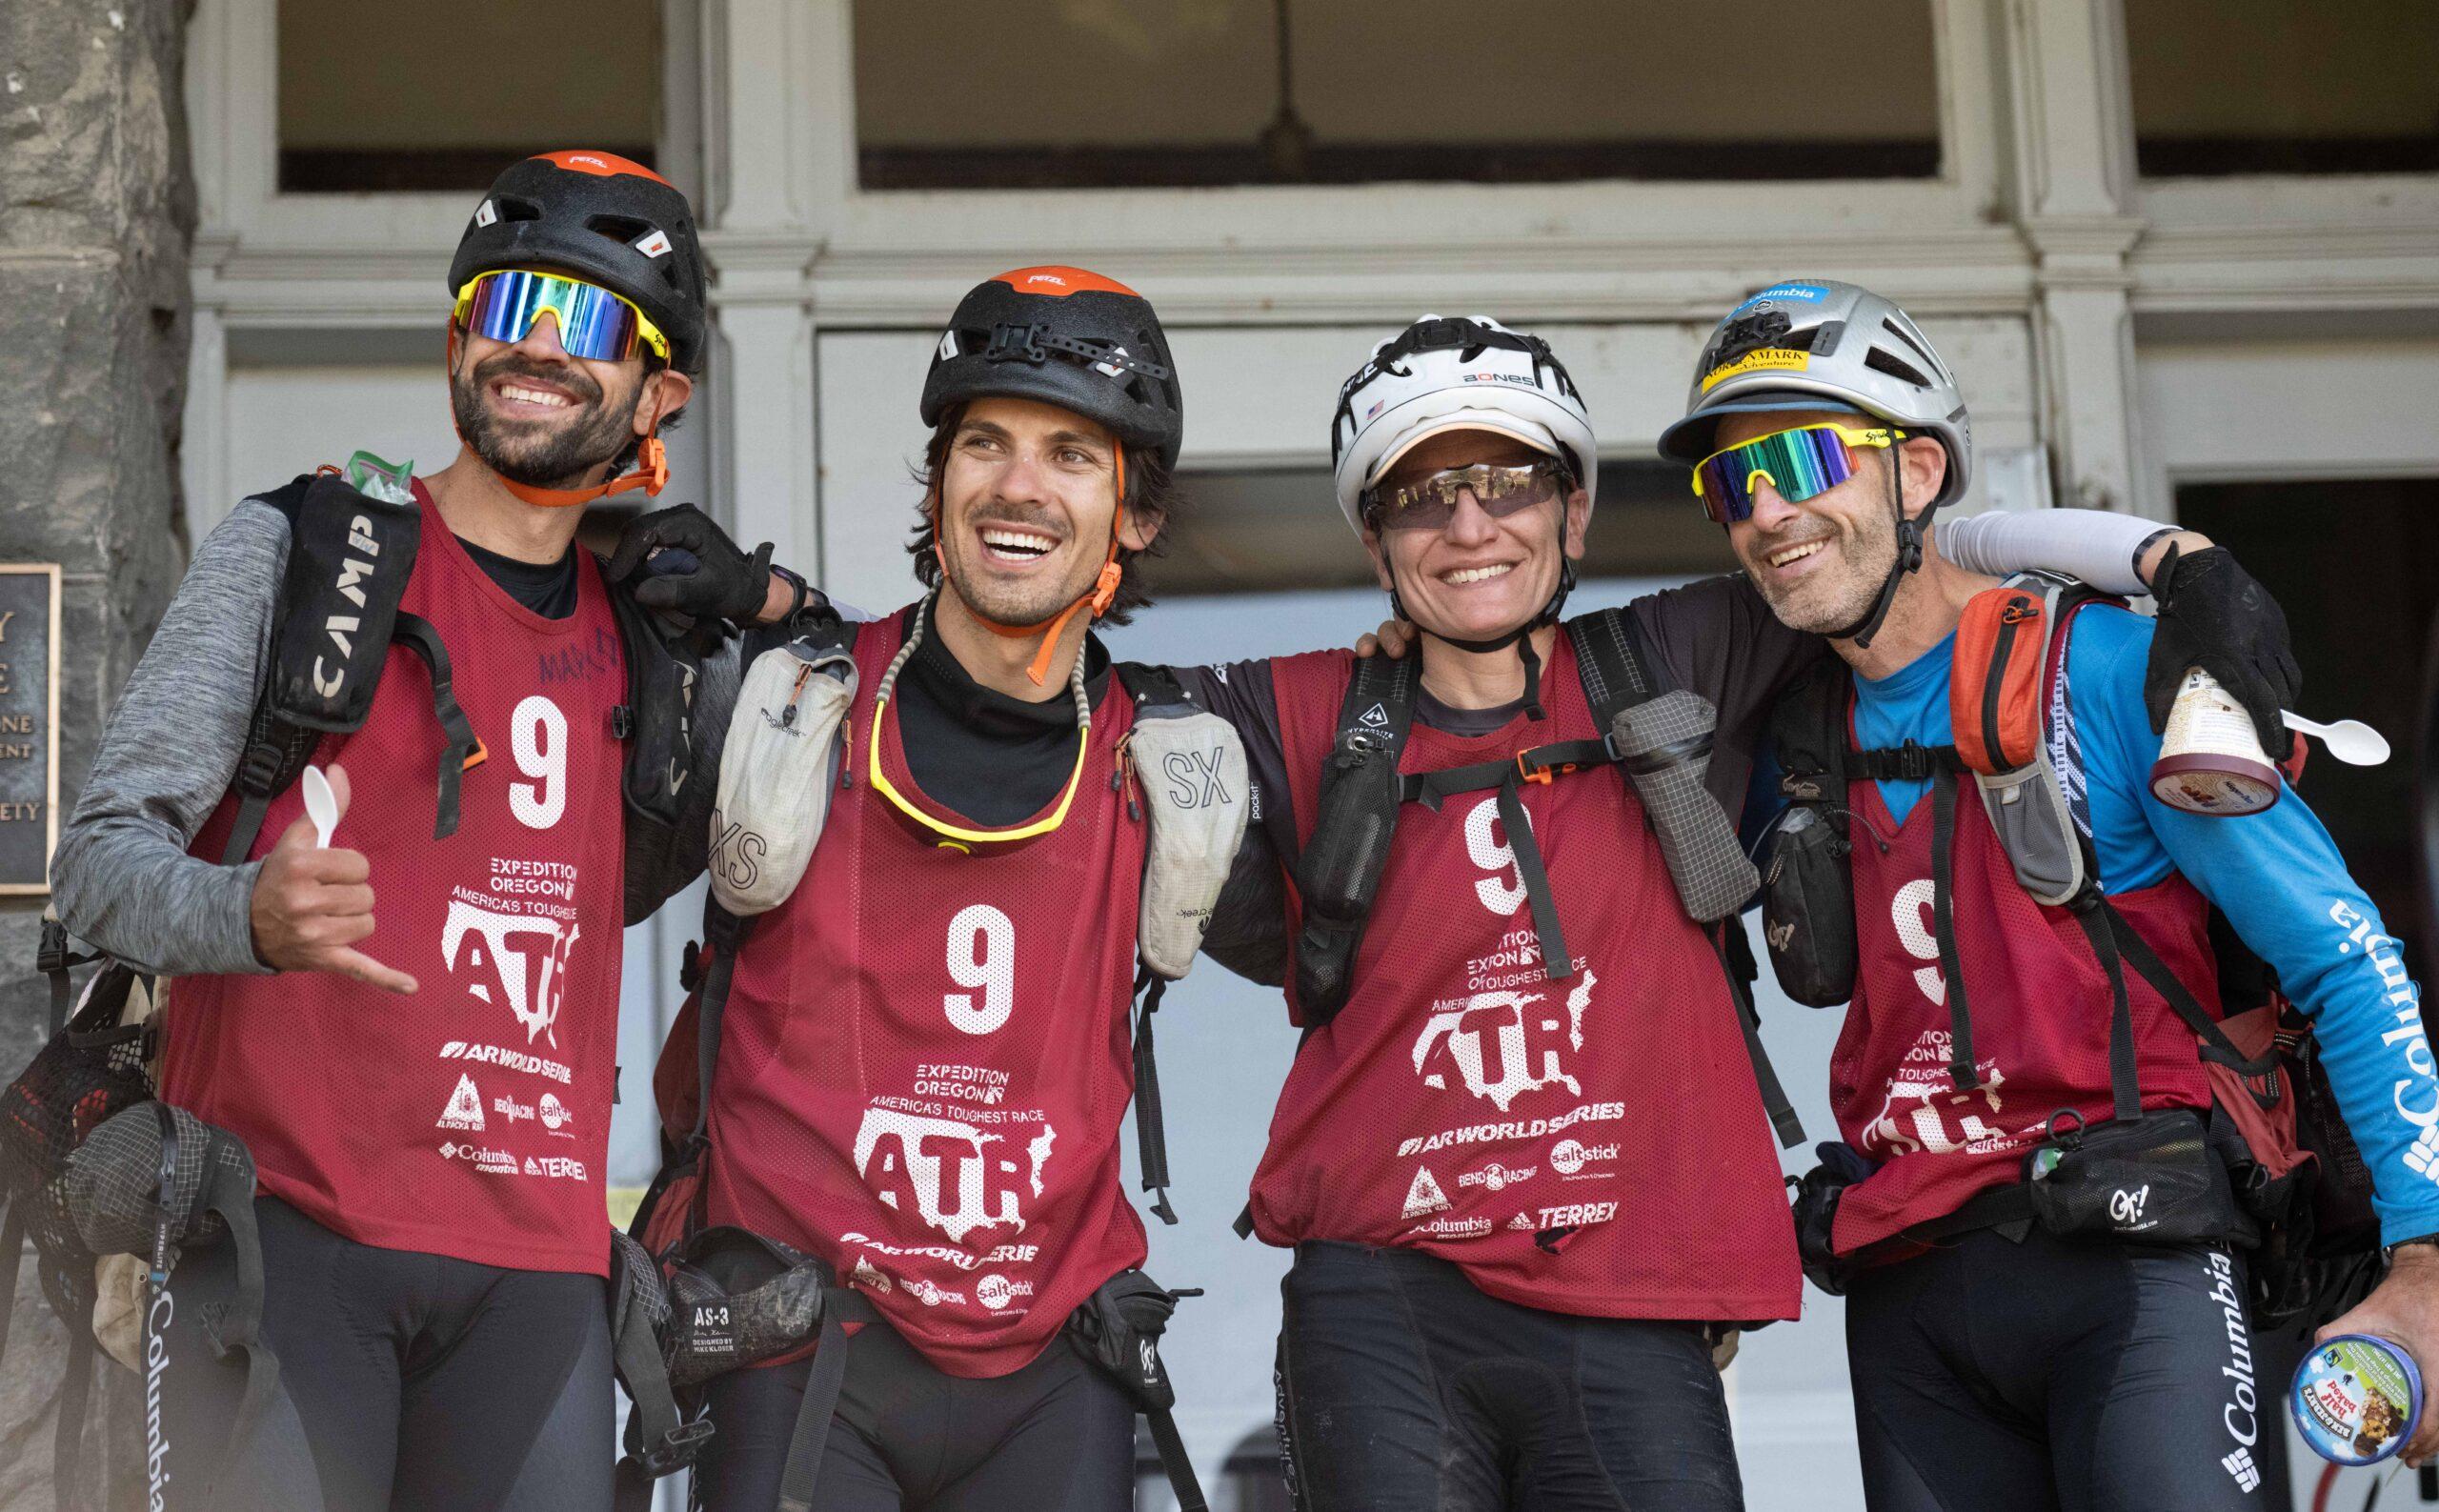 Team La Jolla IVF/Vidaraid